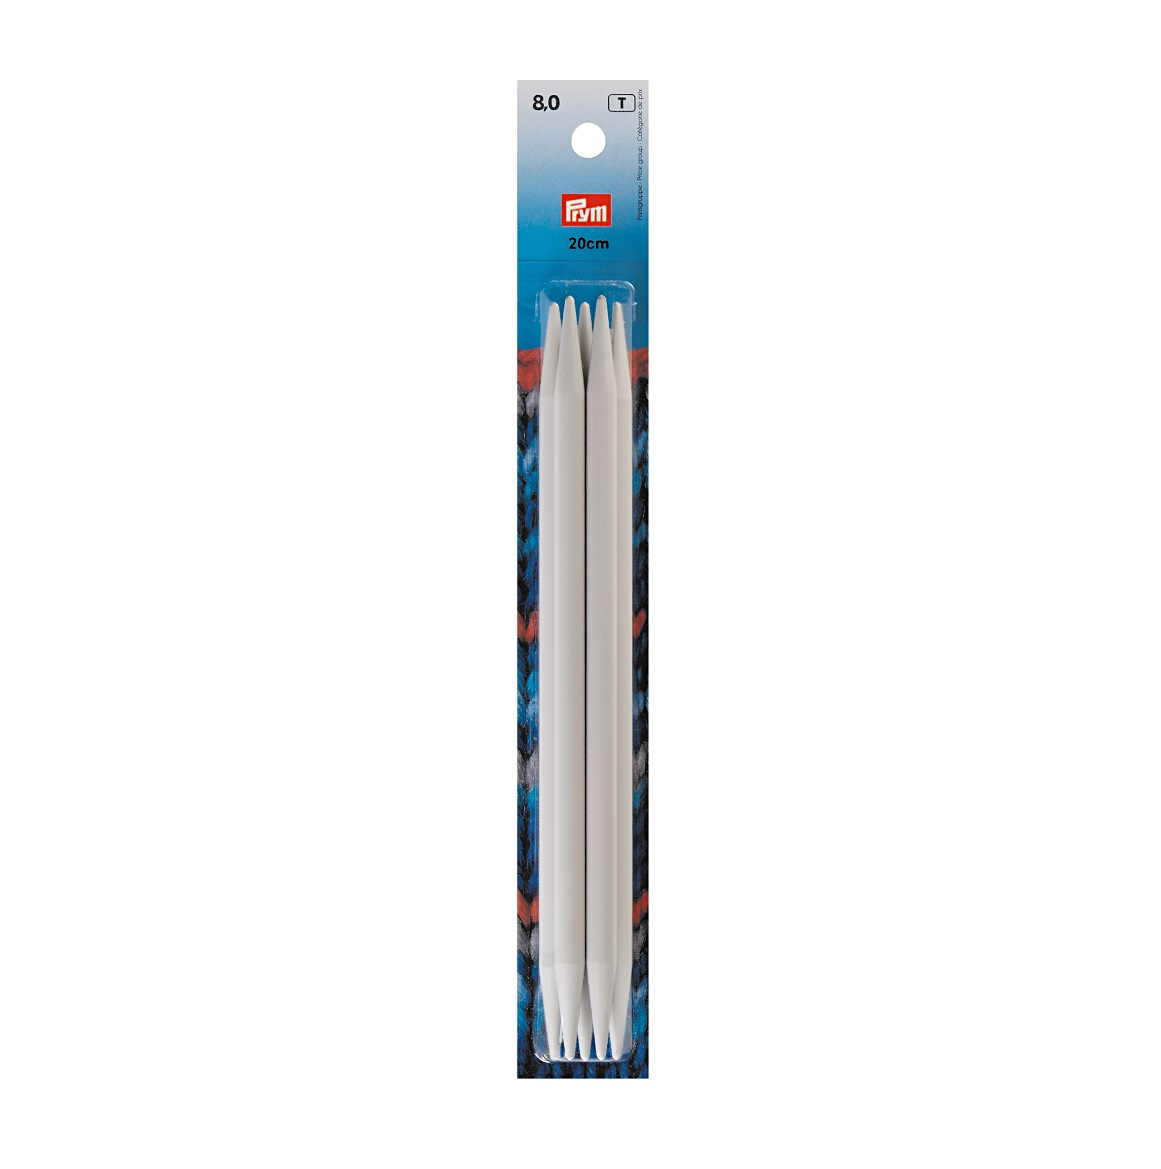 Strumpfstricknadeln, metall, 20 cm, 8,00 mm. Prym 218650